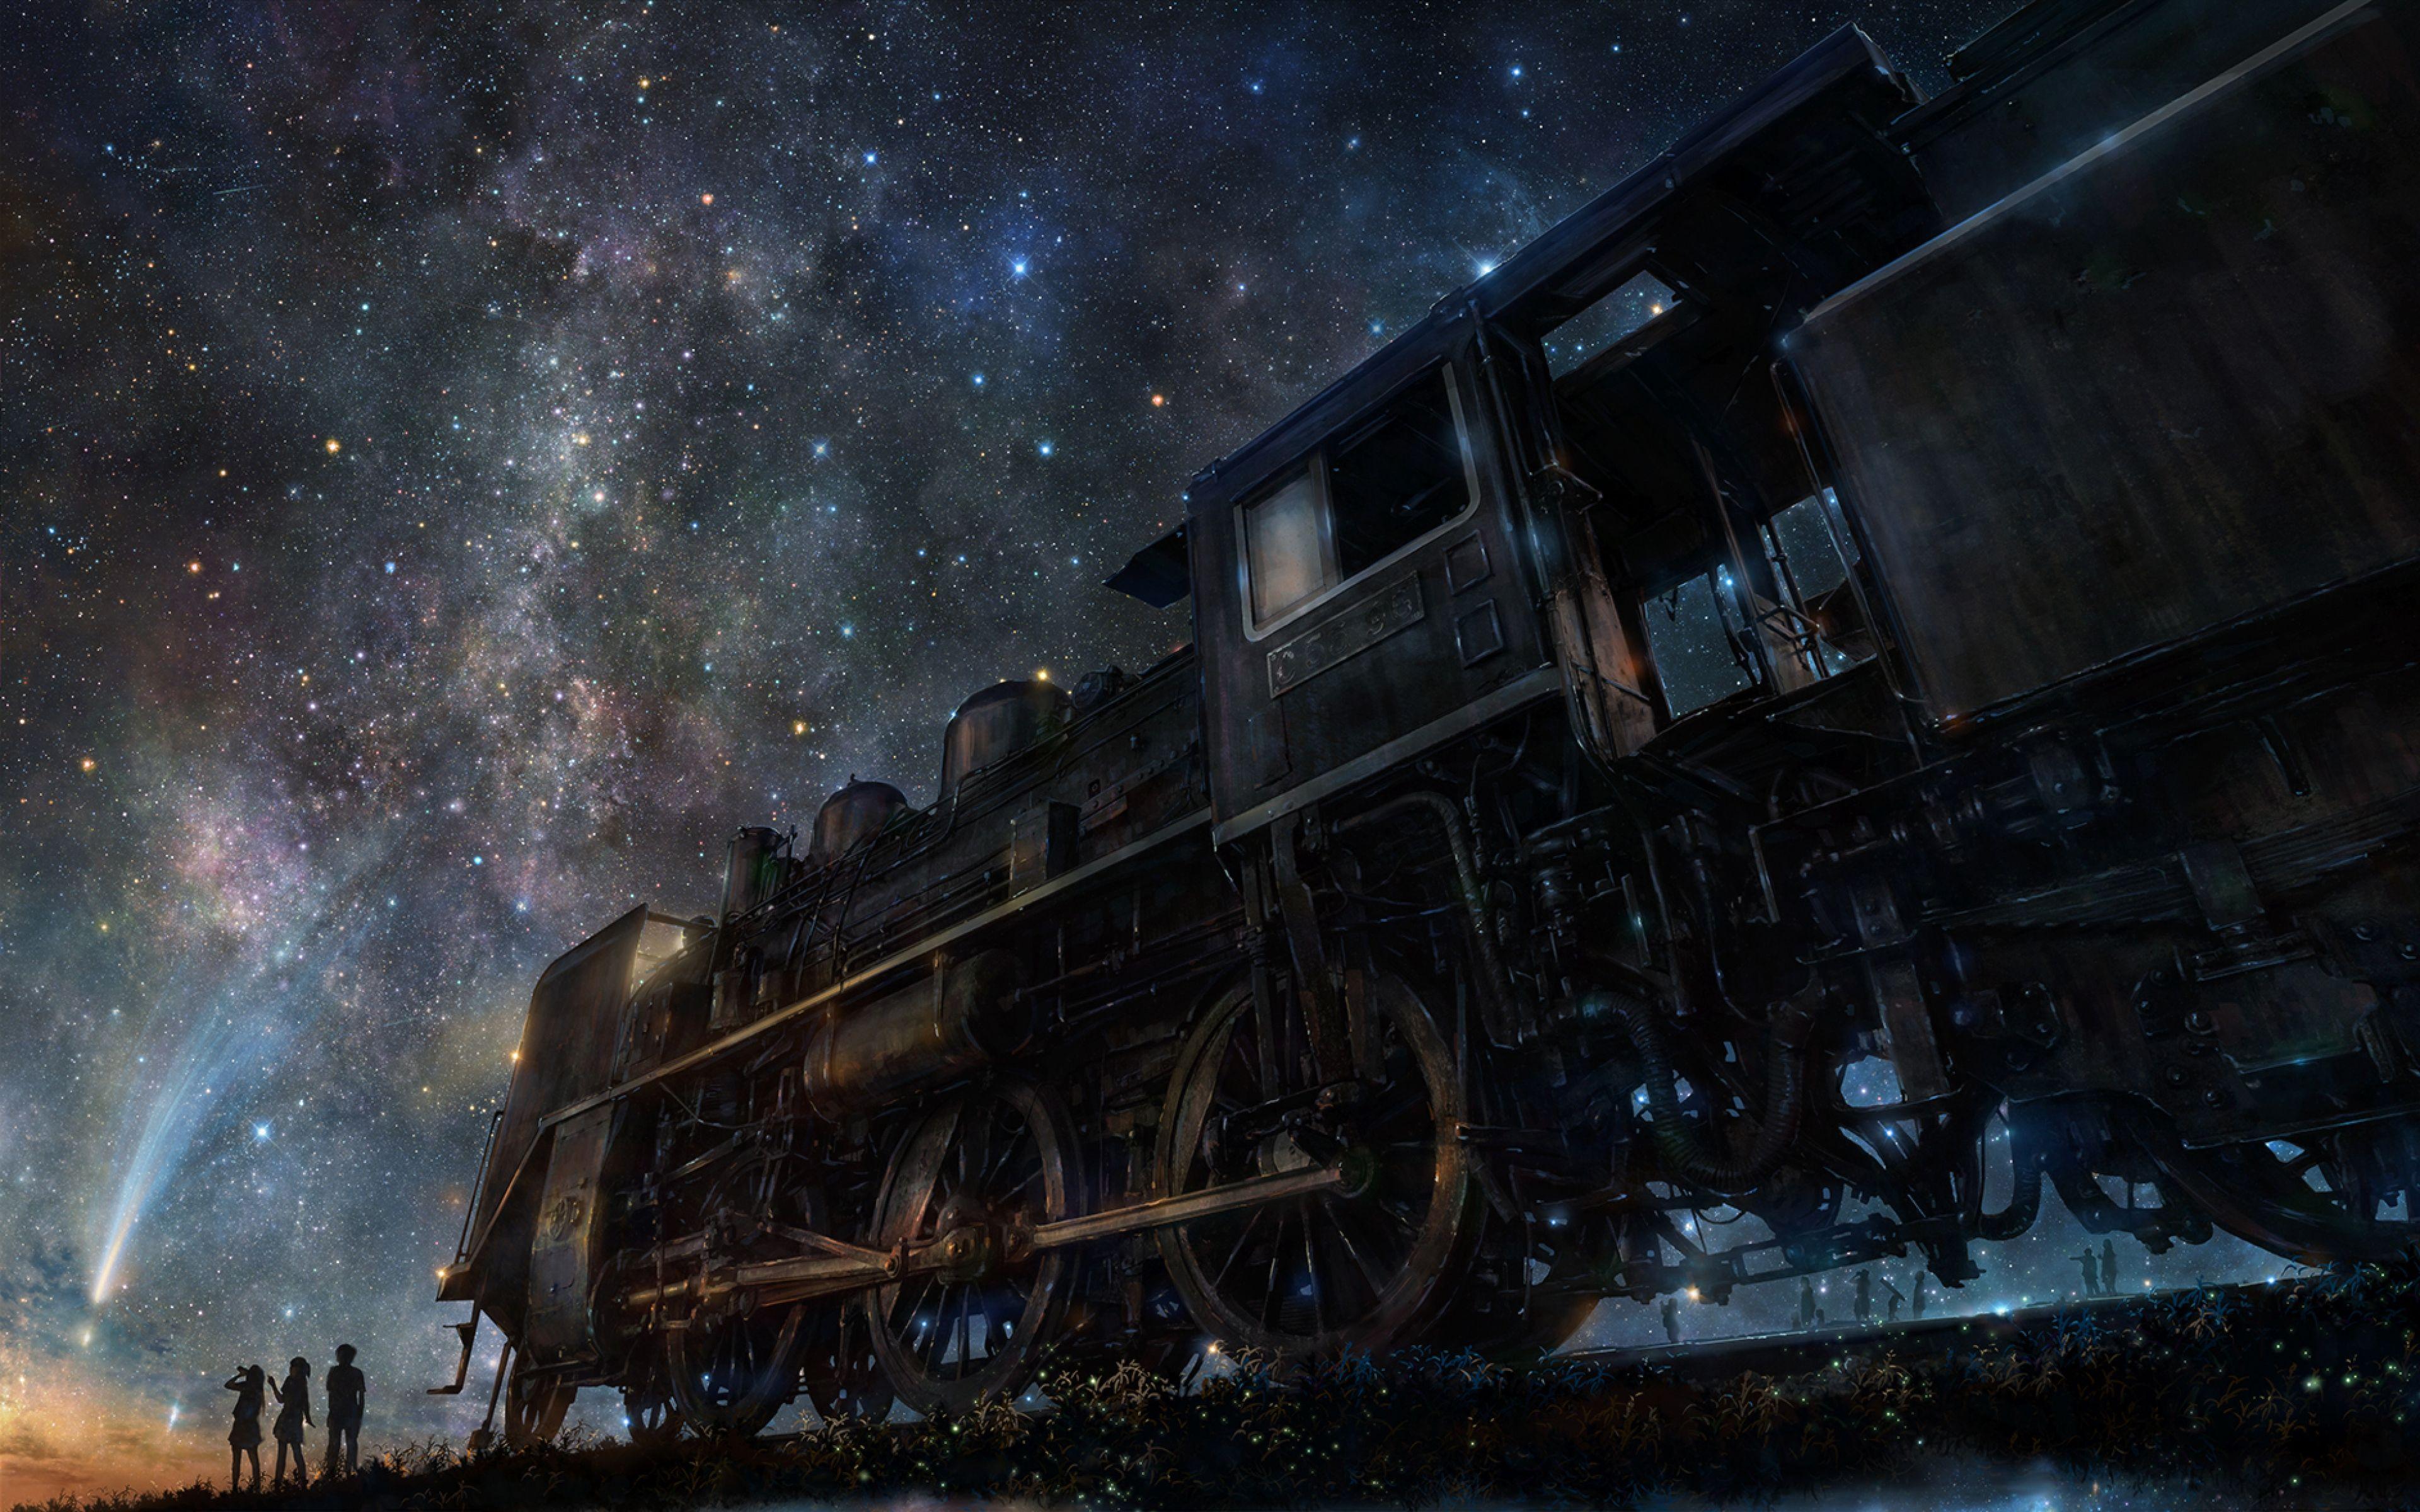 3840x2400 Wallpaper iy tujiki, art, night, train, anime